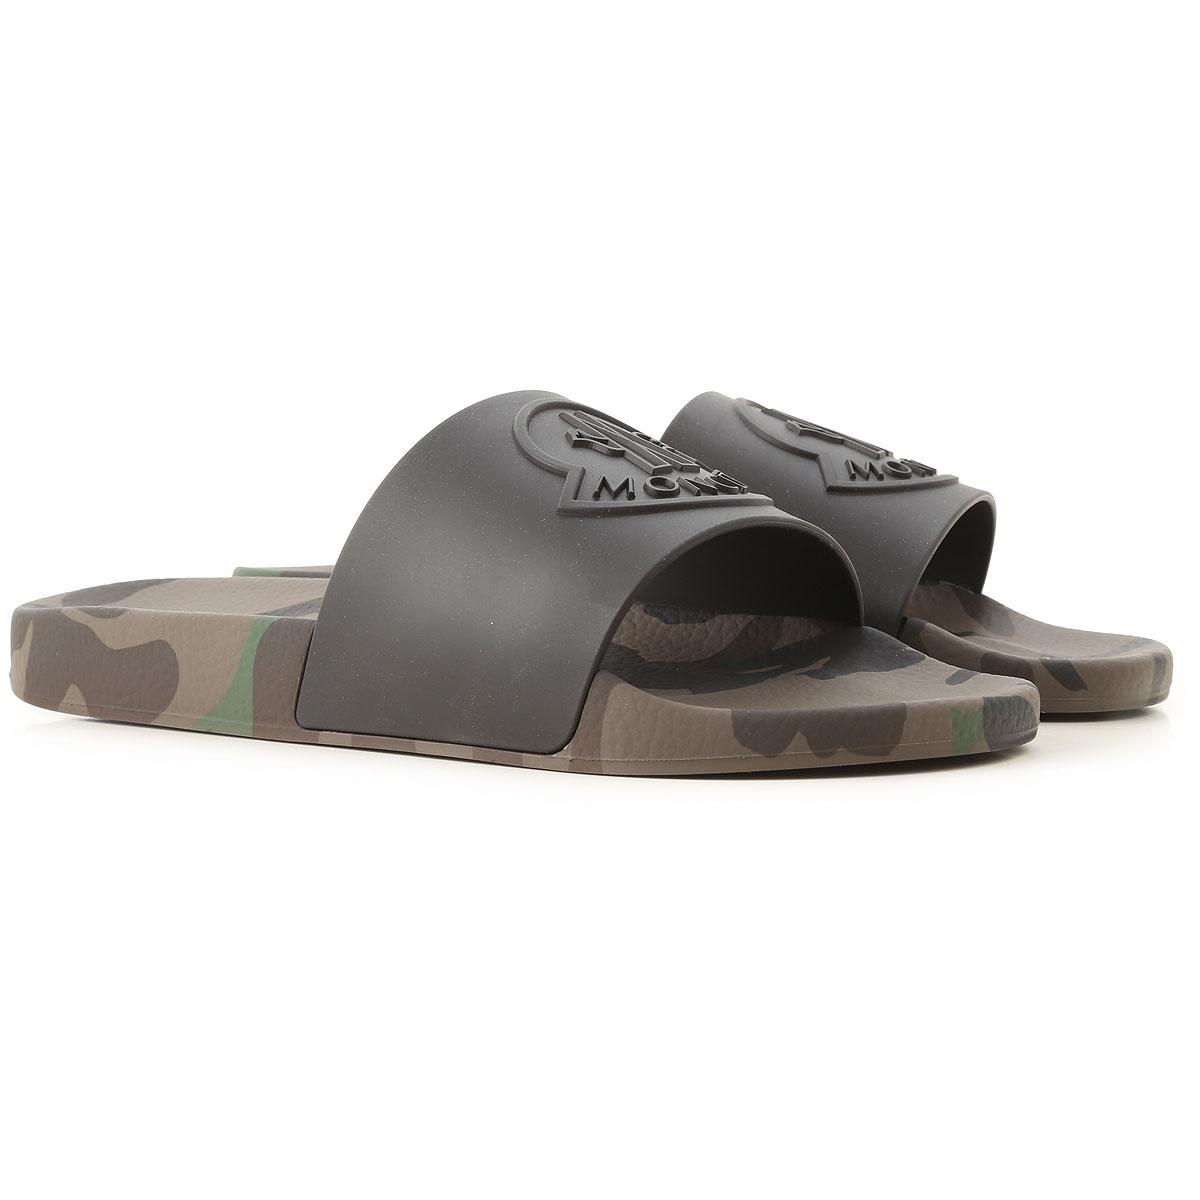 56d82b106245 Moncler. Shoes for Men.   194. COLLECTION. Spring - Summer 2019